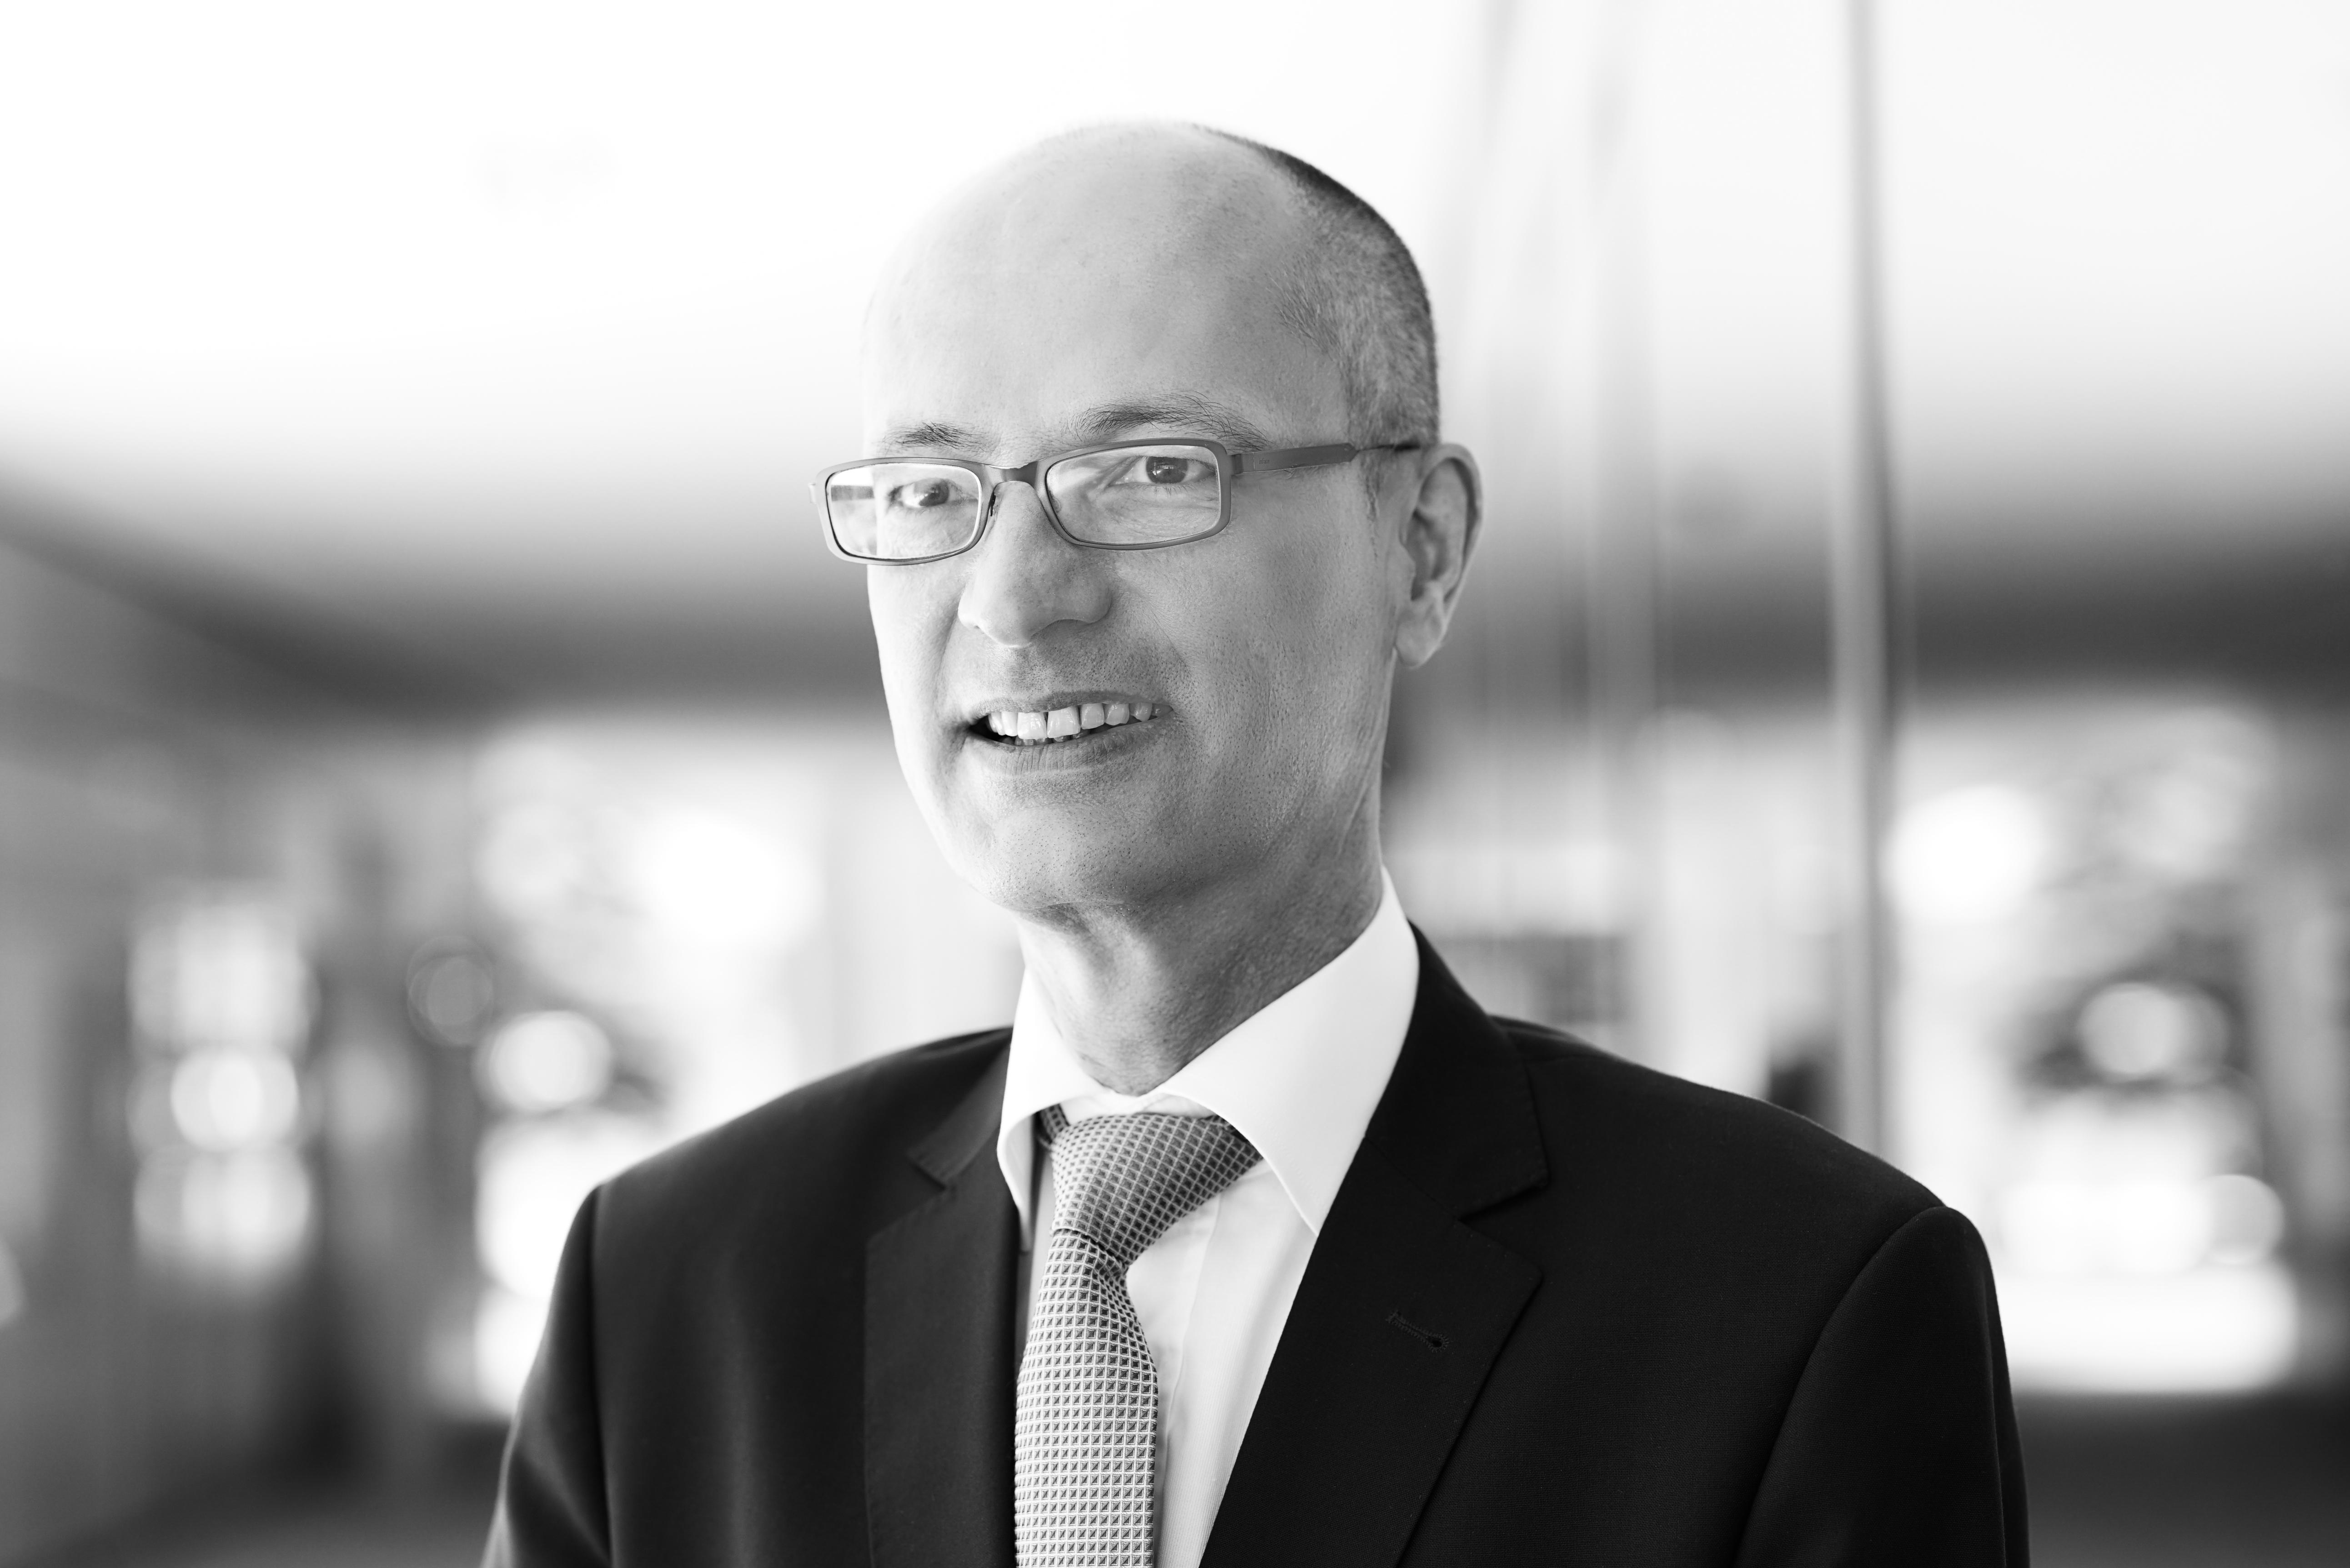 Daniel Wechtenbruch